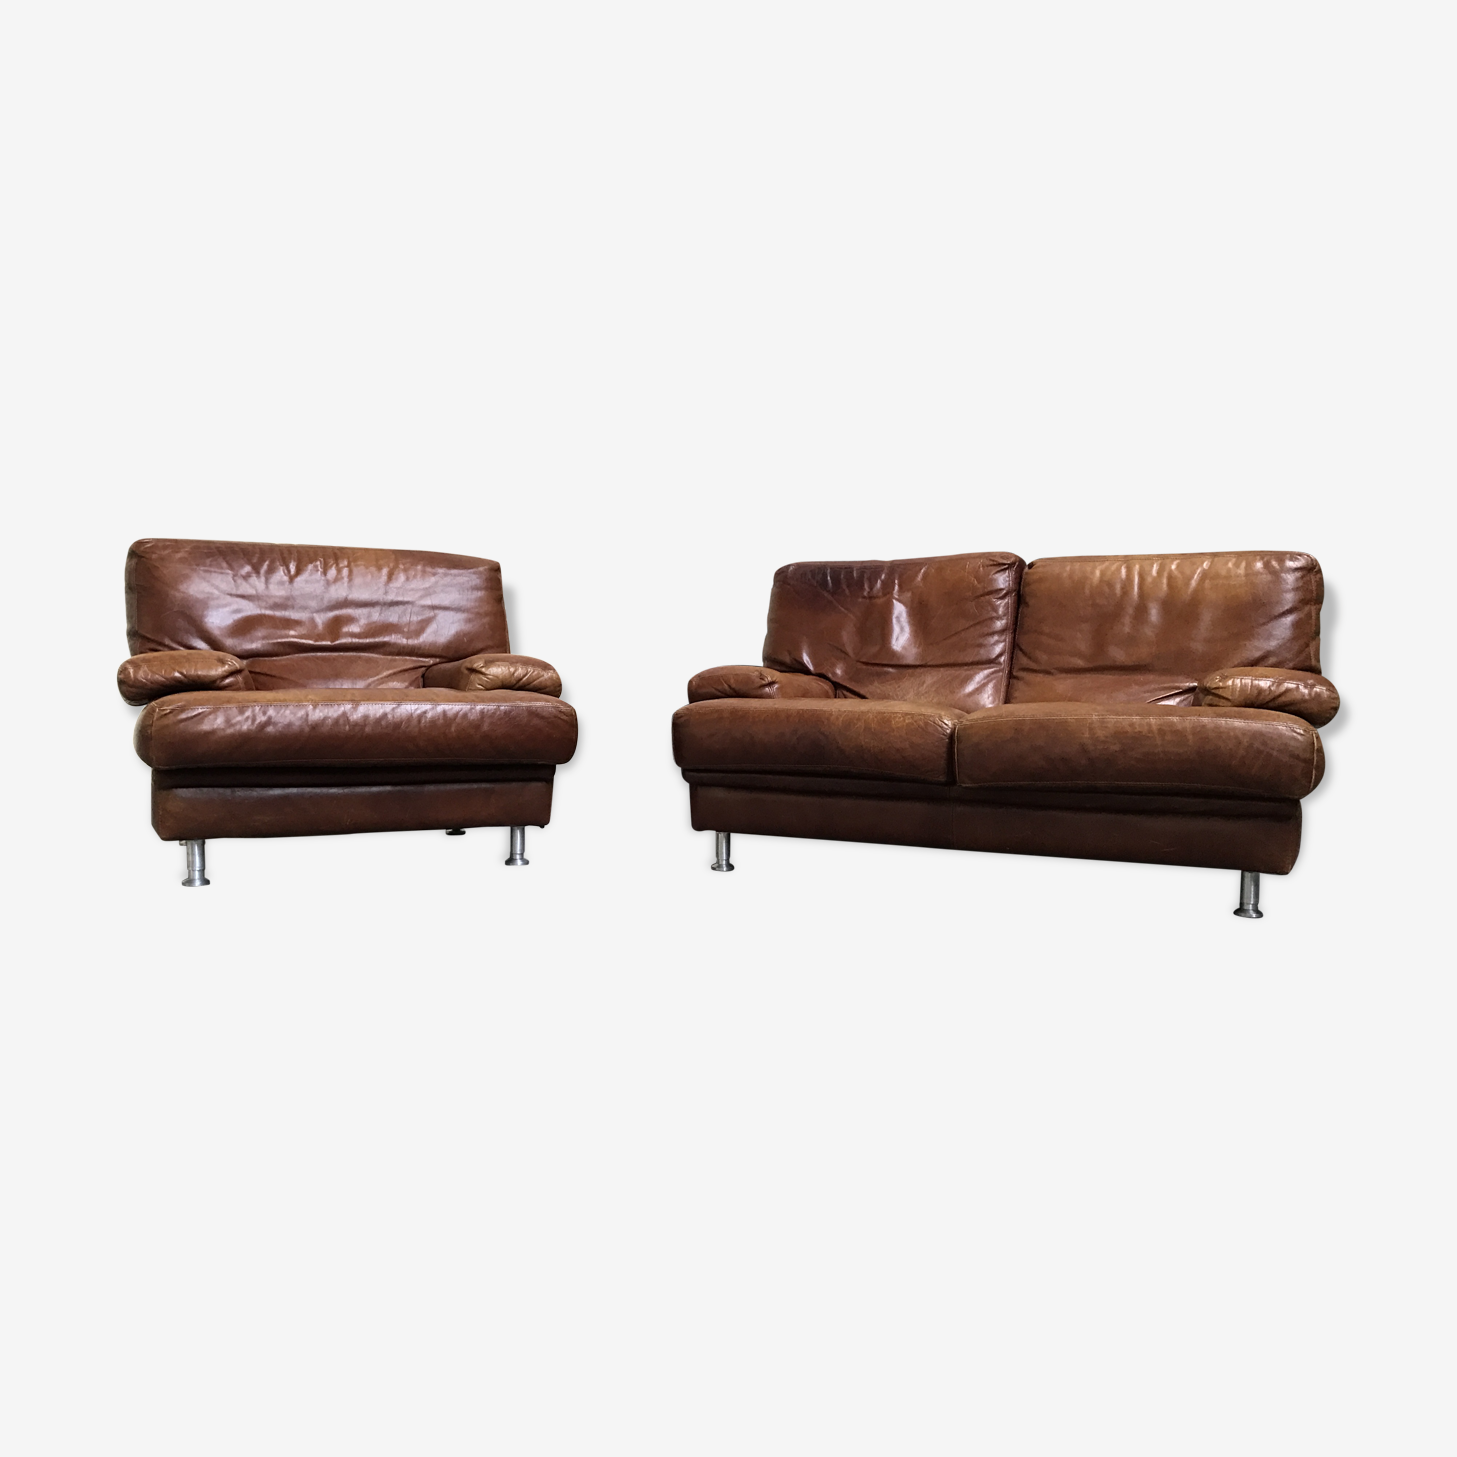 Canape fauteuil cuir roche bobois vintage cuir marron vintage